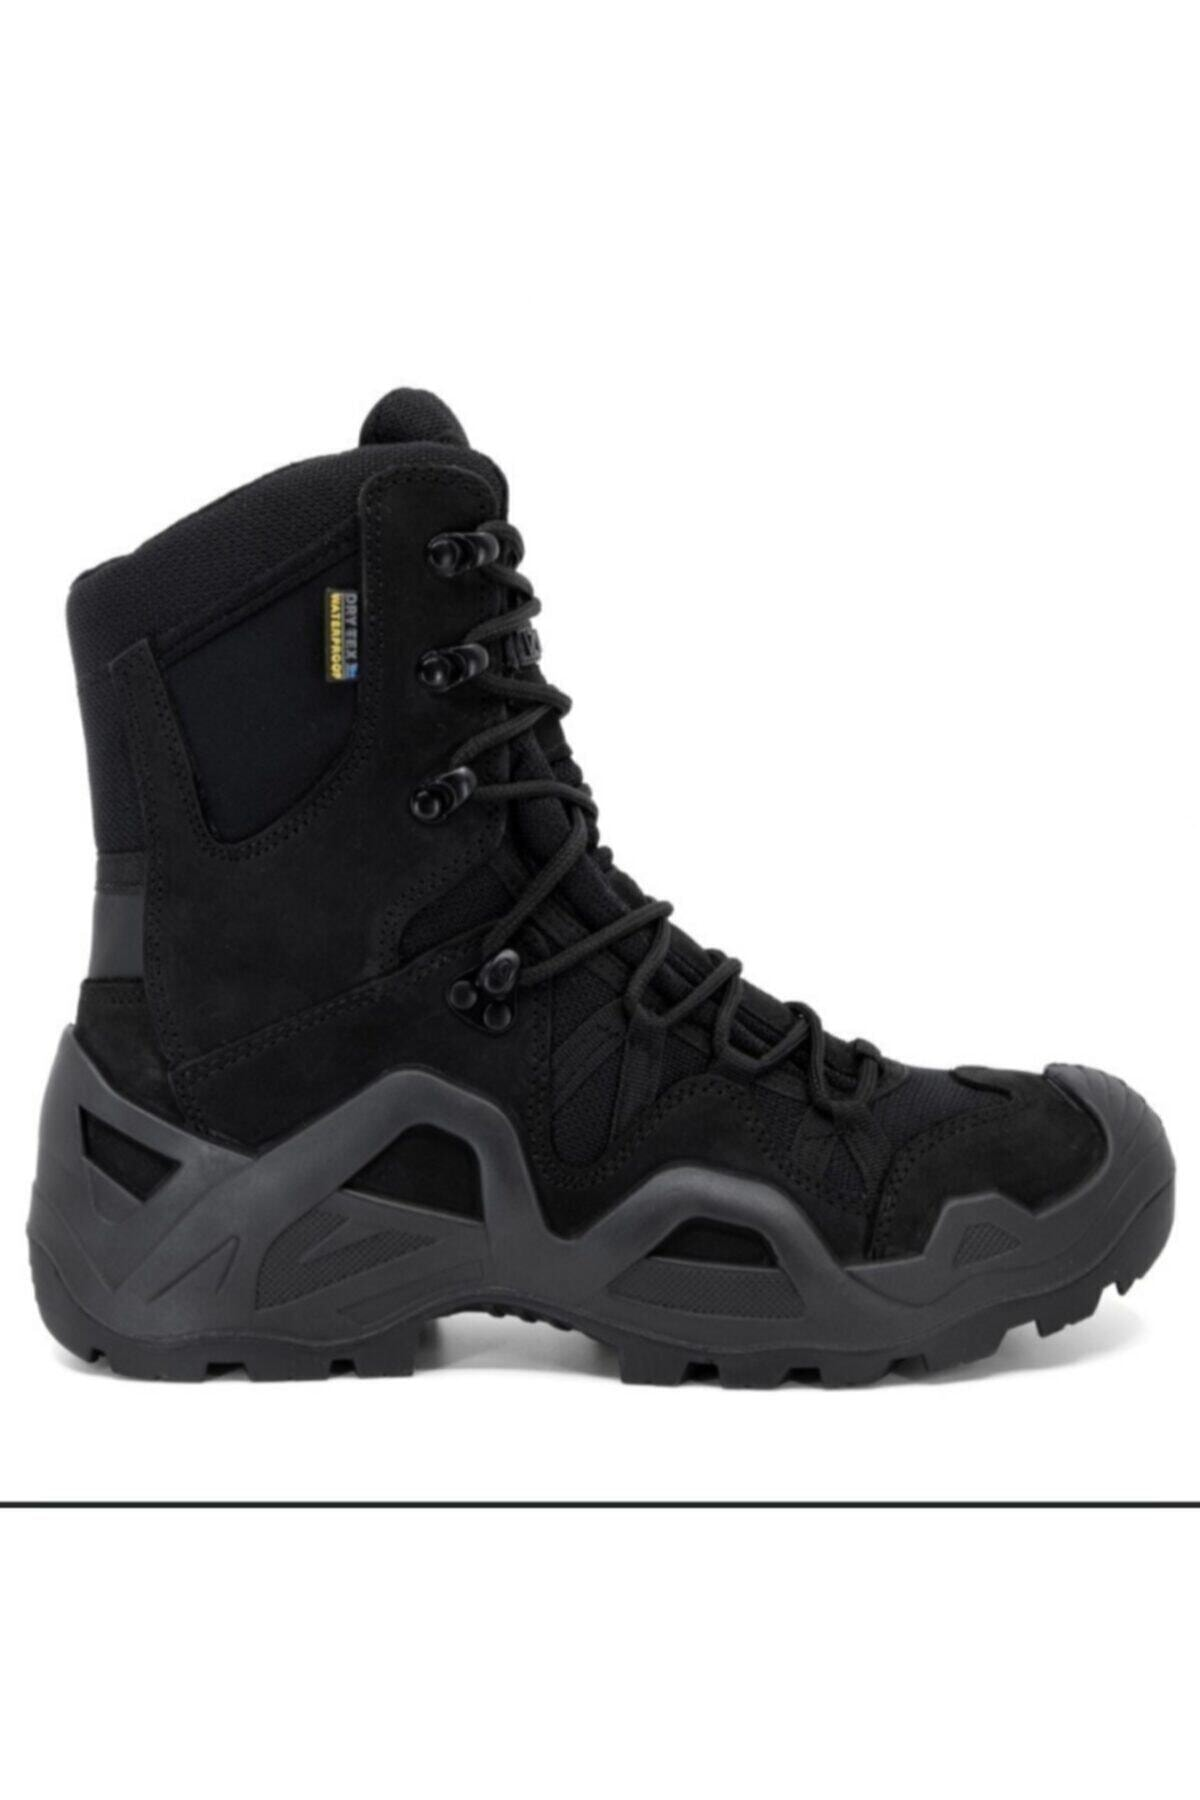 Silyon Askeri Giyim Unisex Siyah Vaneda Askeri Tip Bot 1